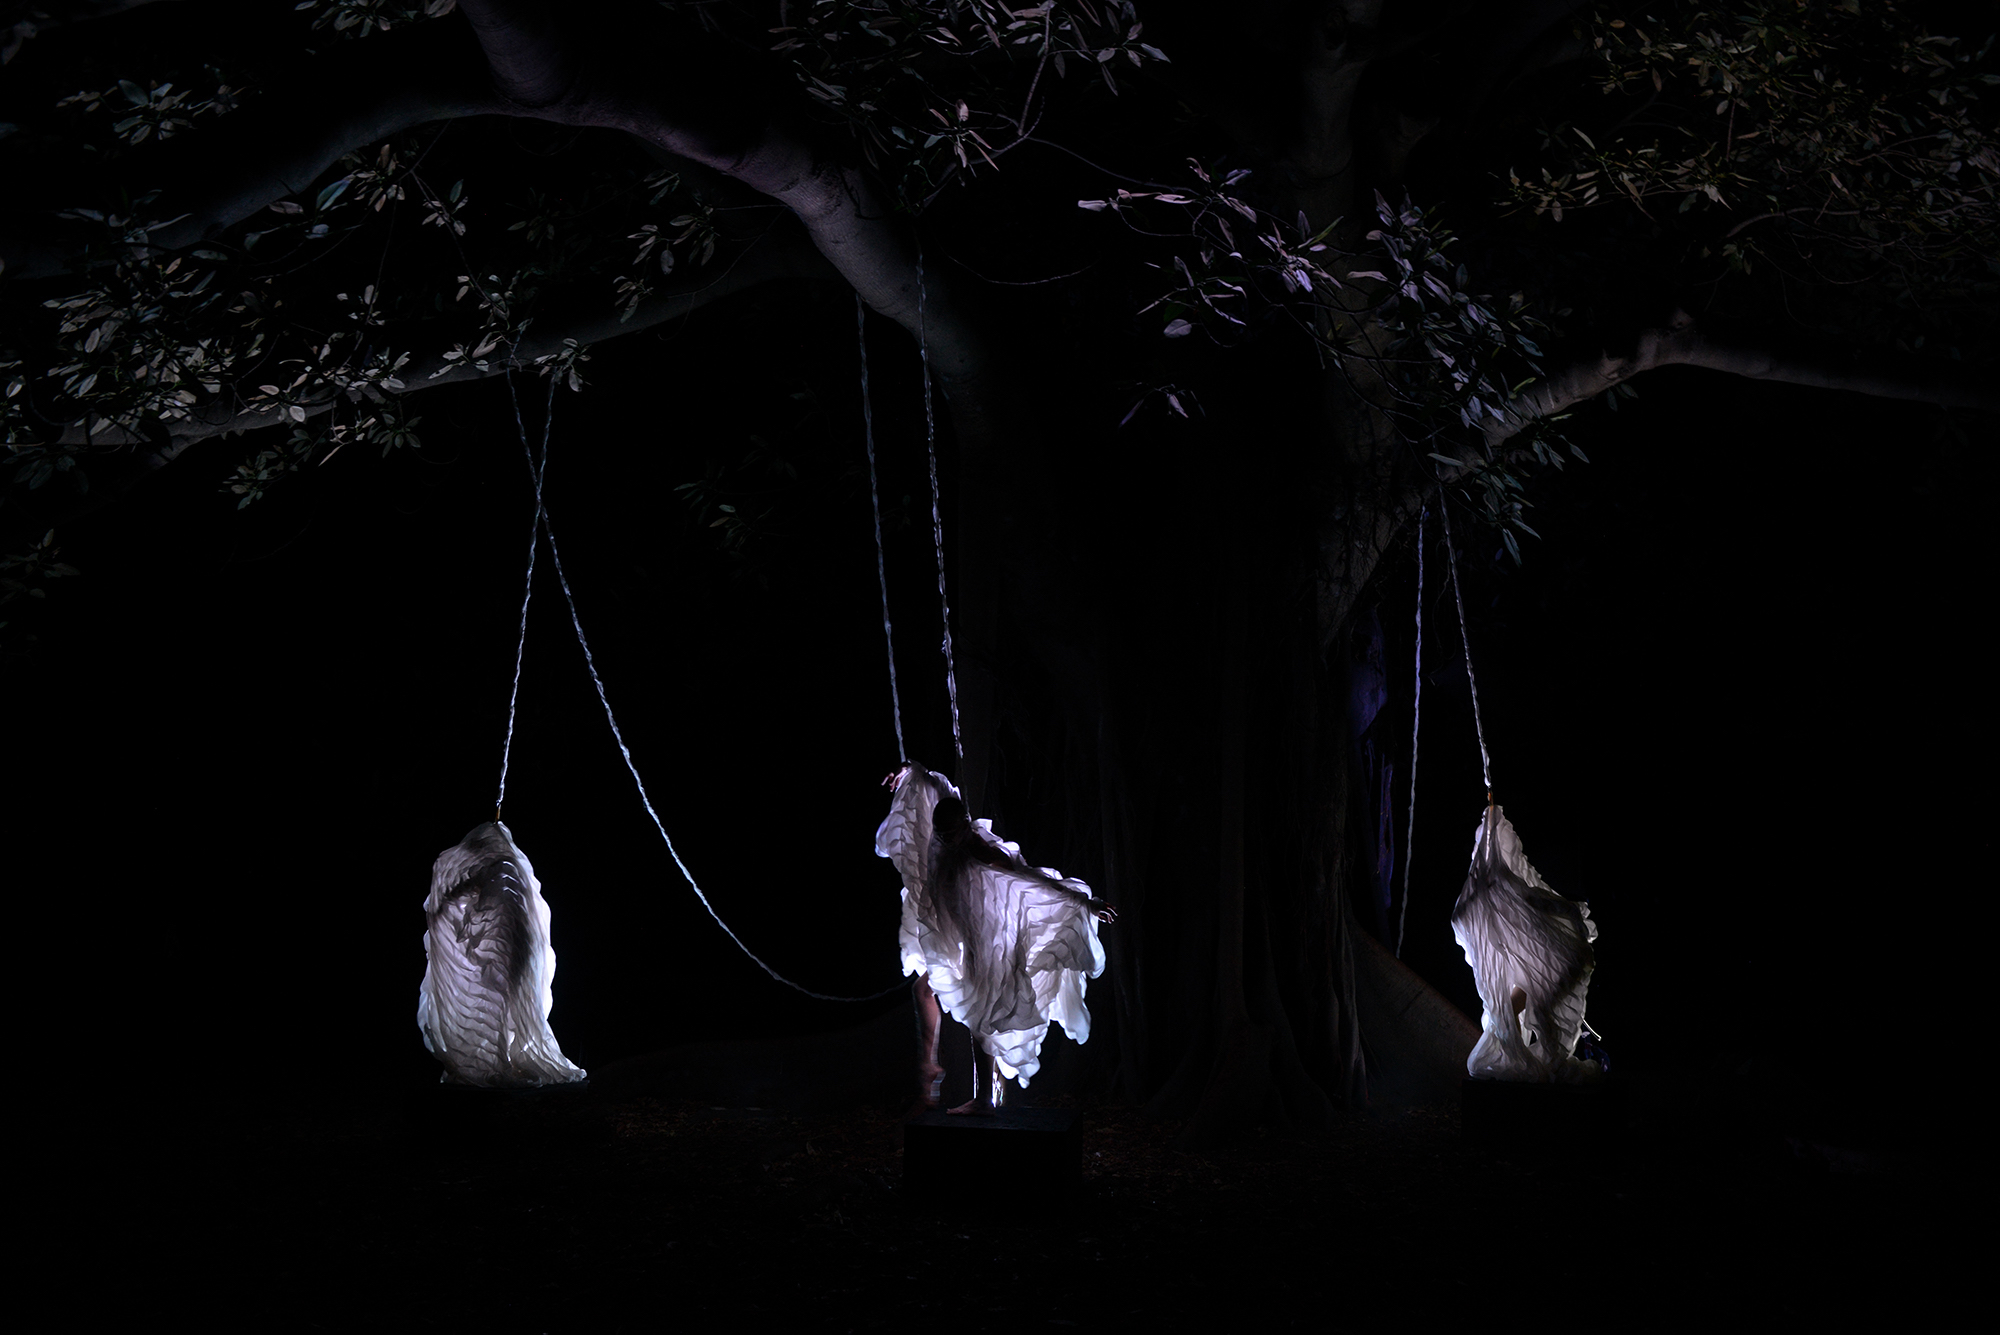 QUAM CHRYSALLIDEM (TREE ATTACHMENT) - a live art investigation of inhabitation :: VIVID Sydney 2018, Royal Botanic Gardens  silk; bonded thread; light  inhabitable sculptures Anastasia La Fey ; performer/ inhabitants LARVAE collaborator, Samuel Hartnett-Welk  and Holly Durant & Lily Paskas